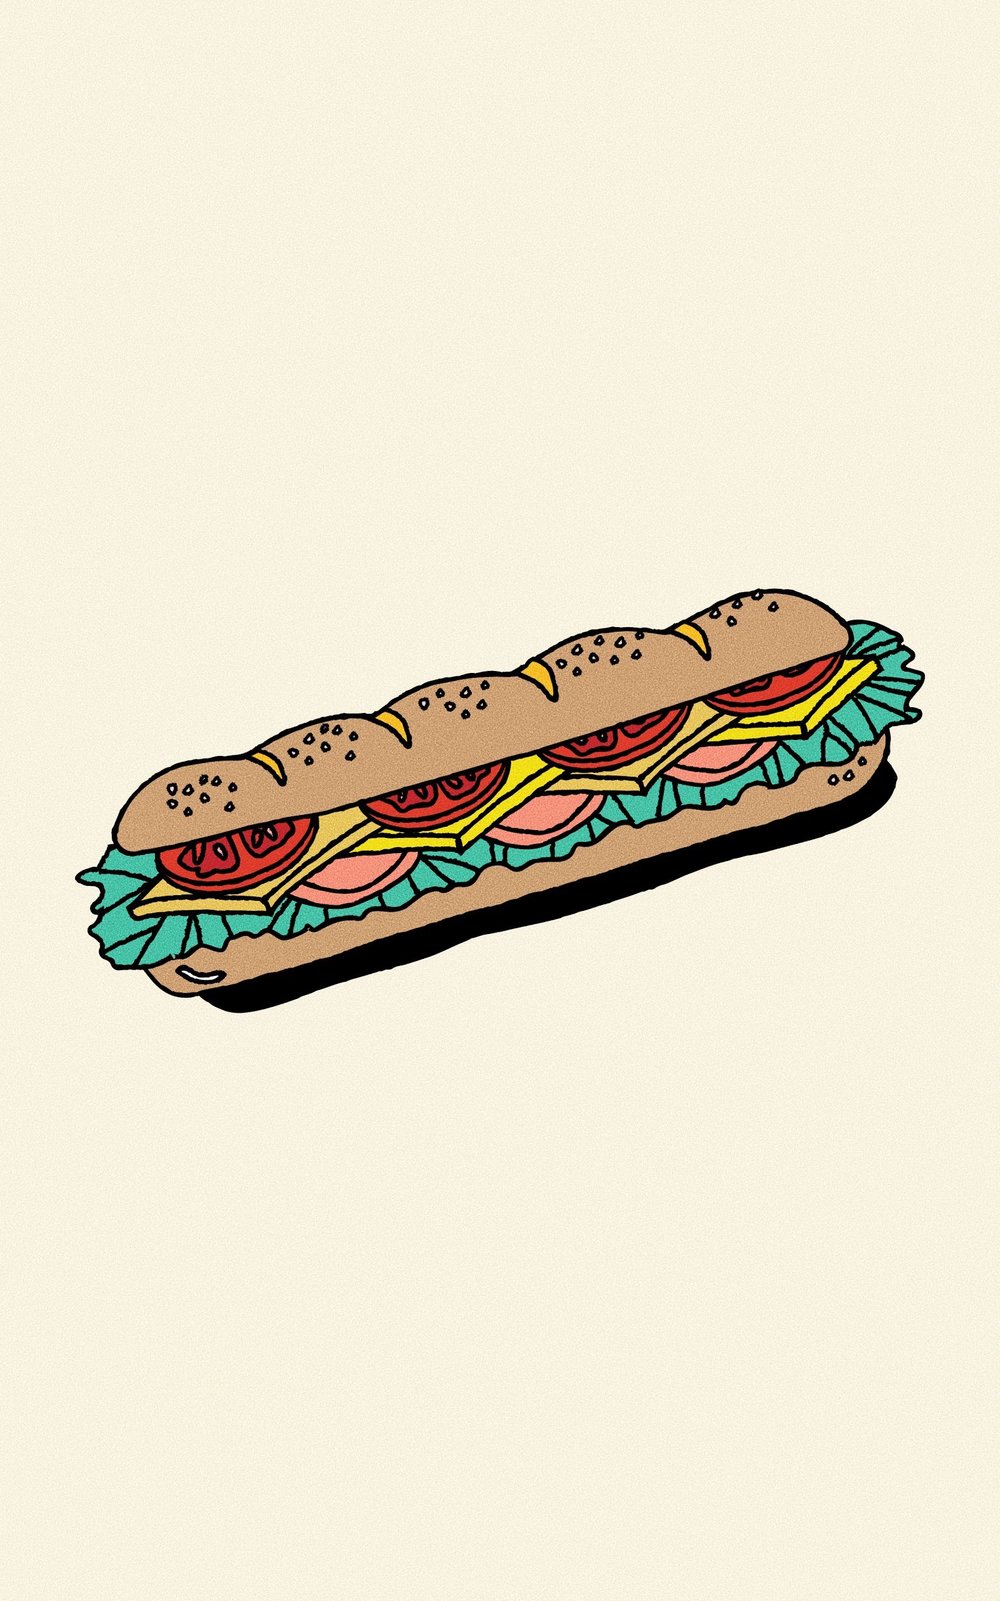 Foodles_69.jpeg